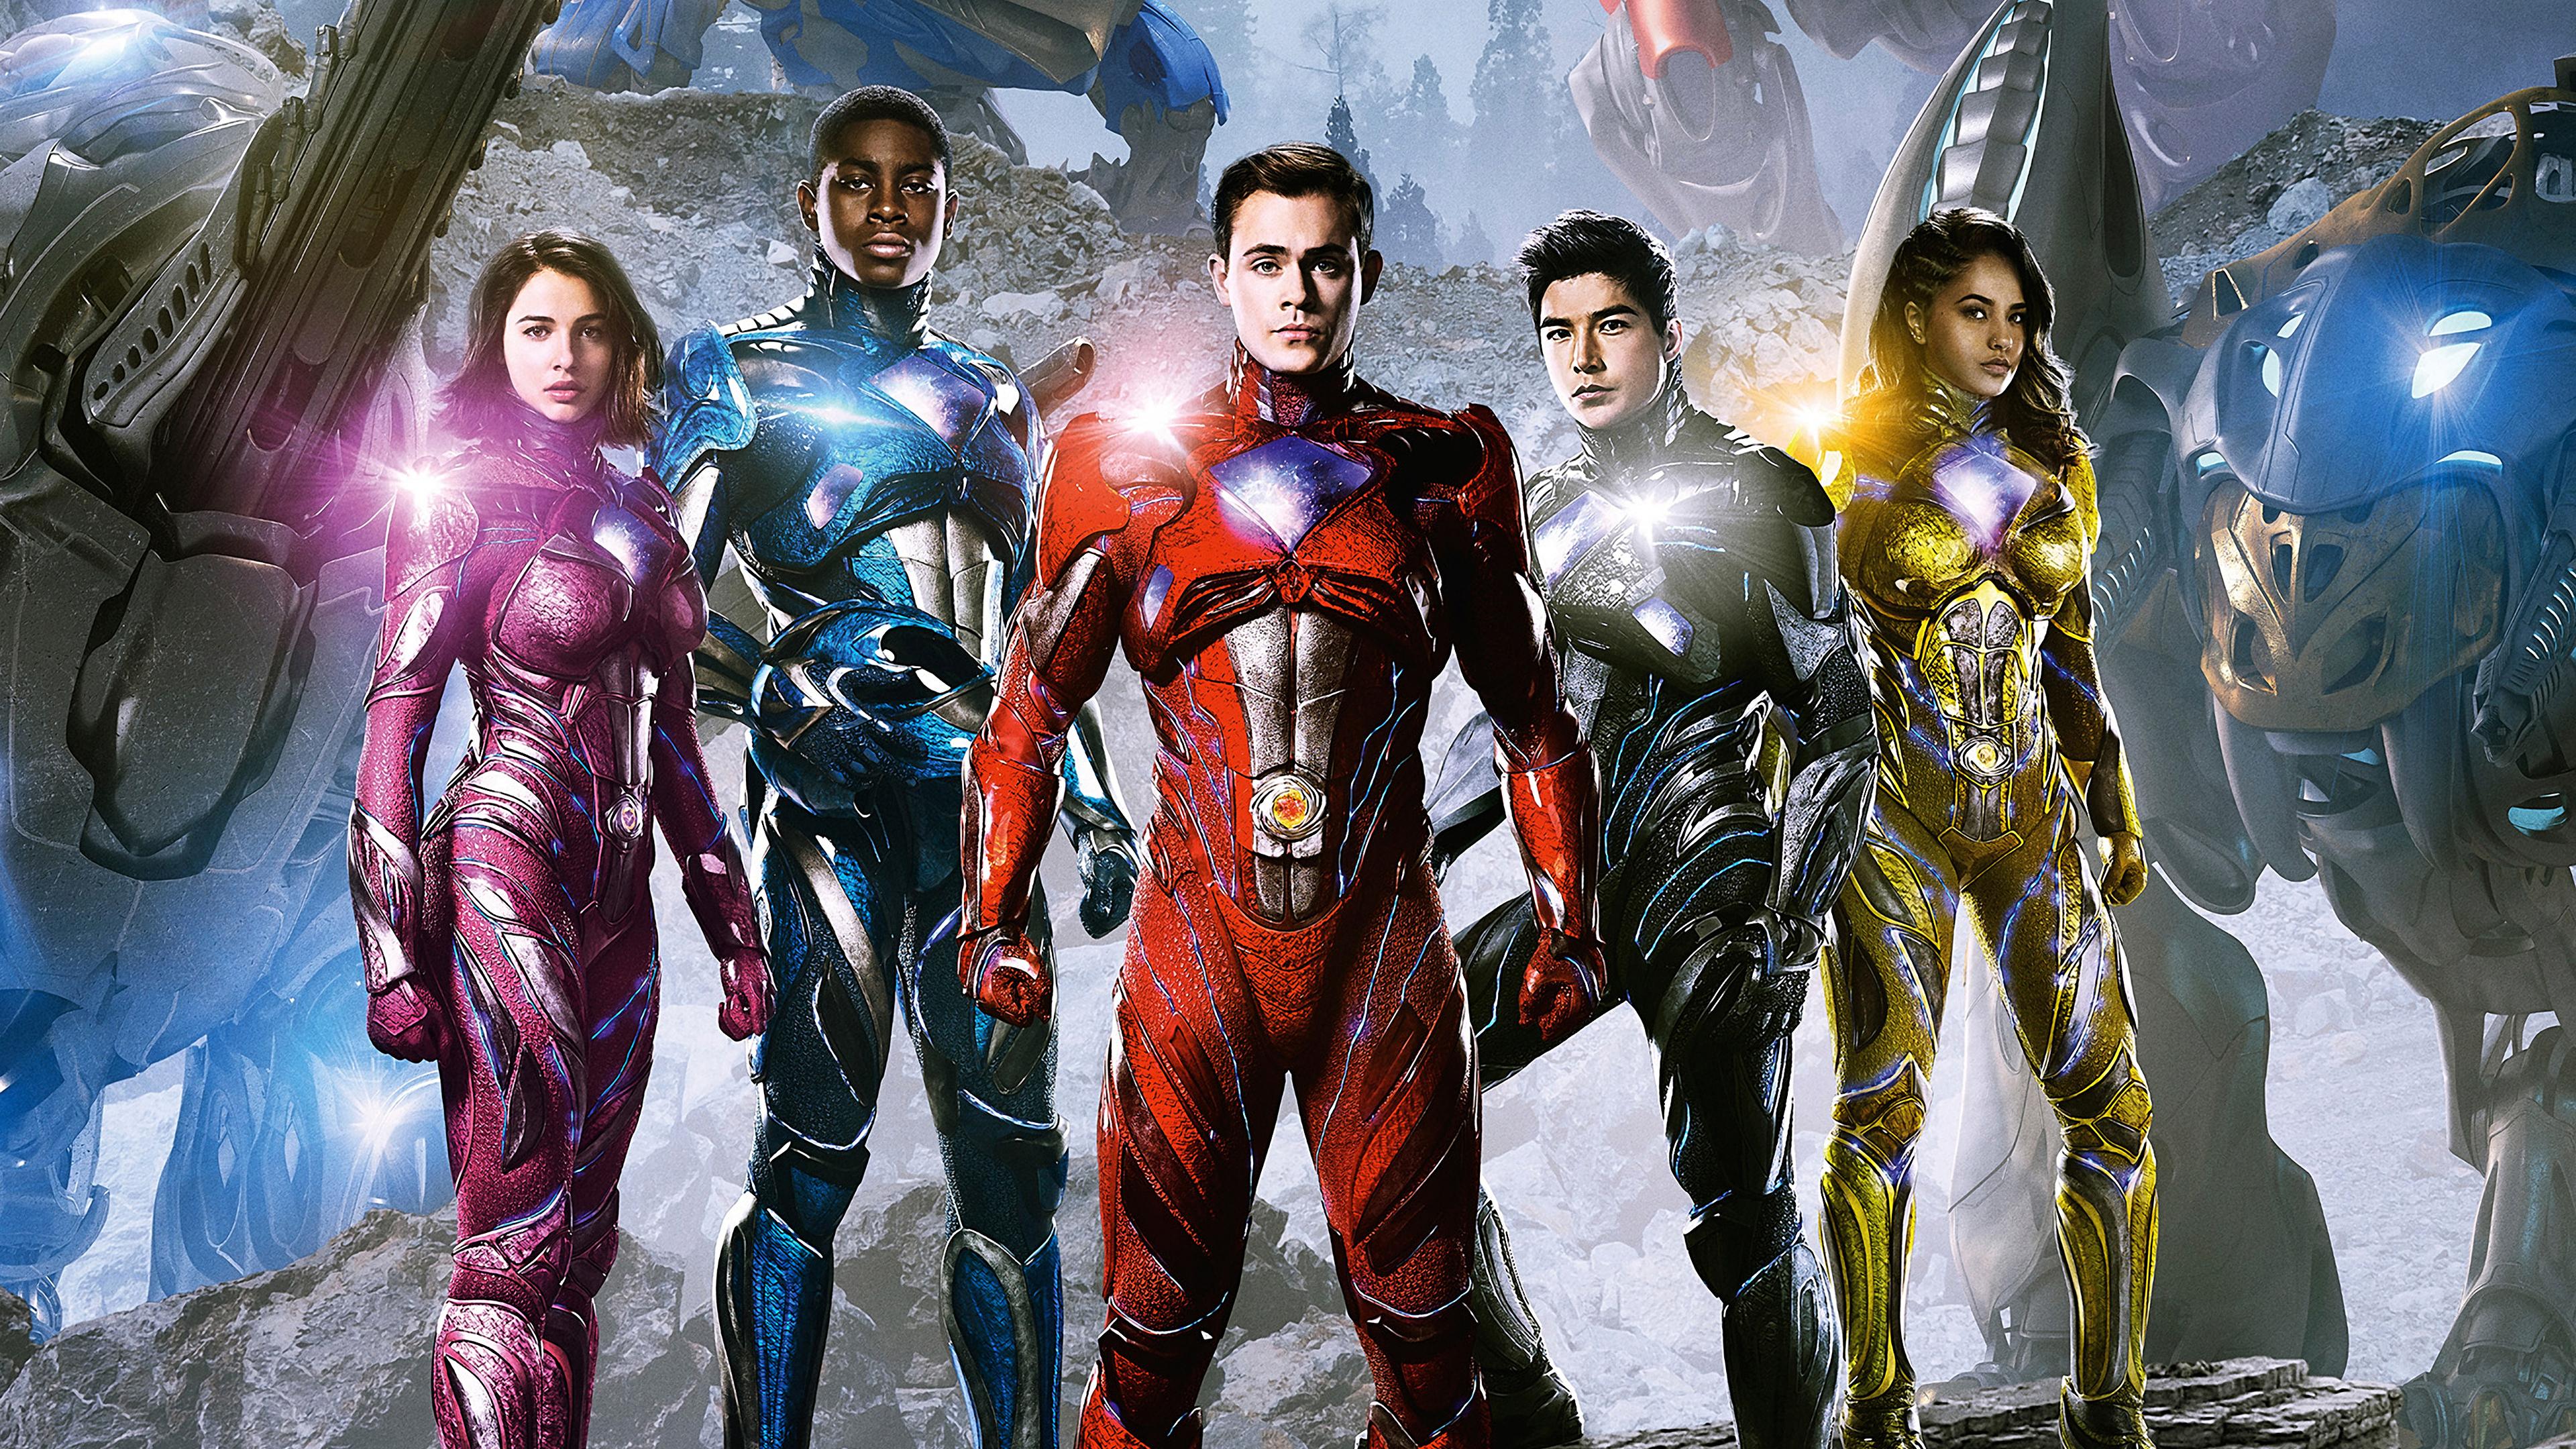 Wallpaper 4k Power Rangers Movie 2017 movies wallpapers 4k 3840x2160